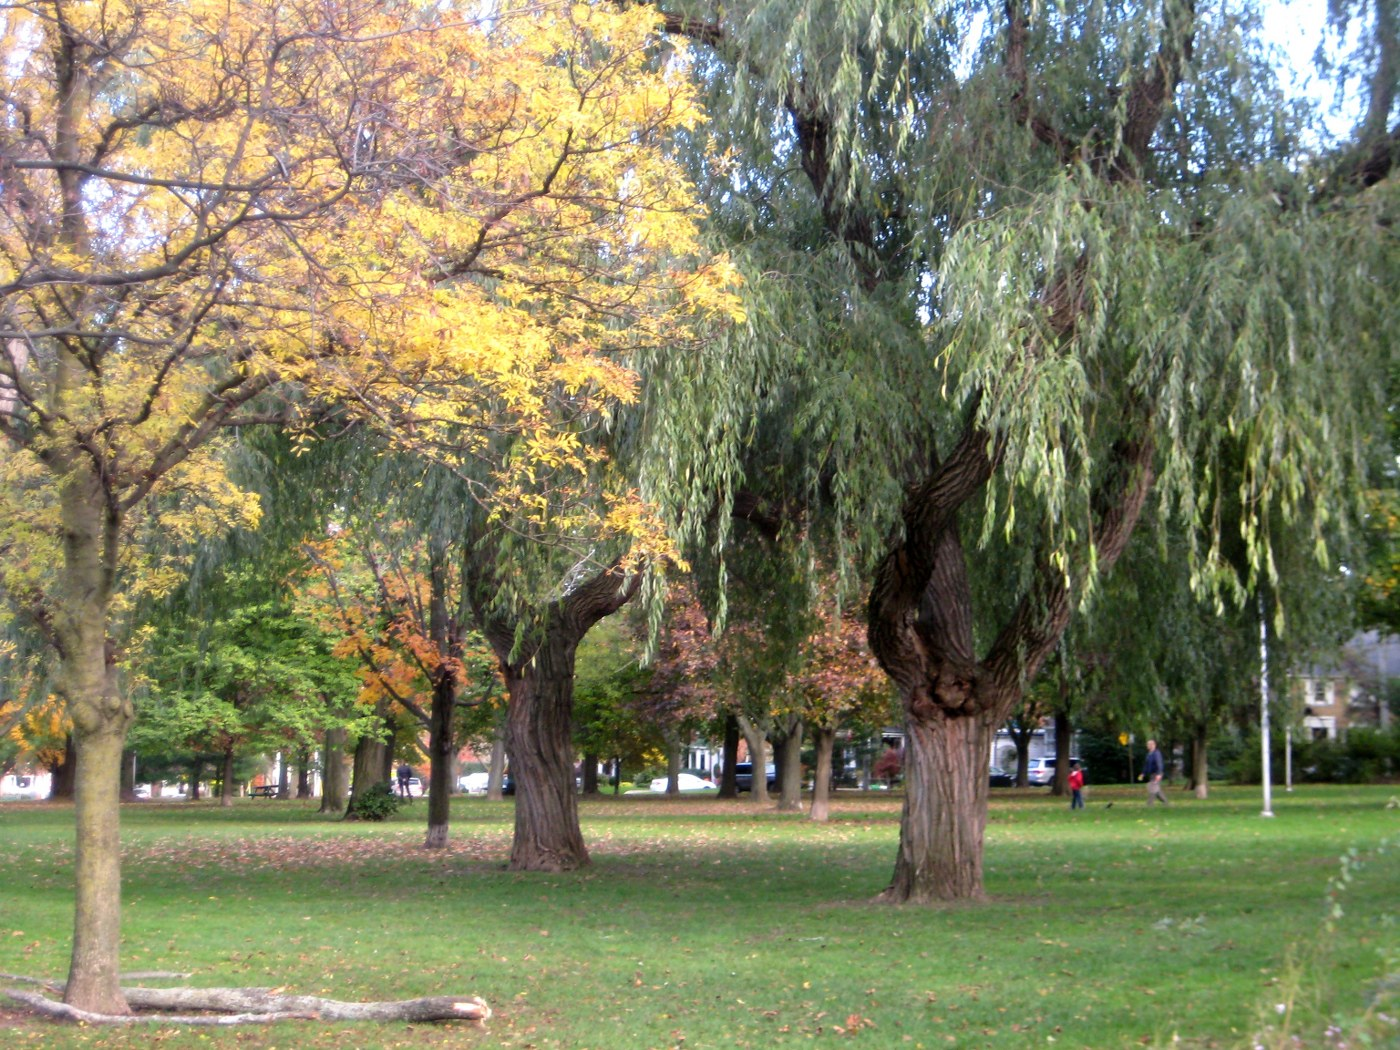 Wanless Park